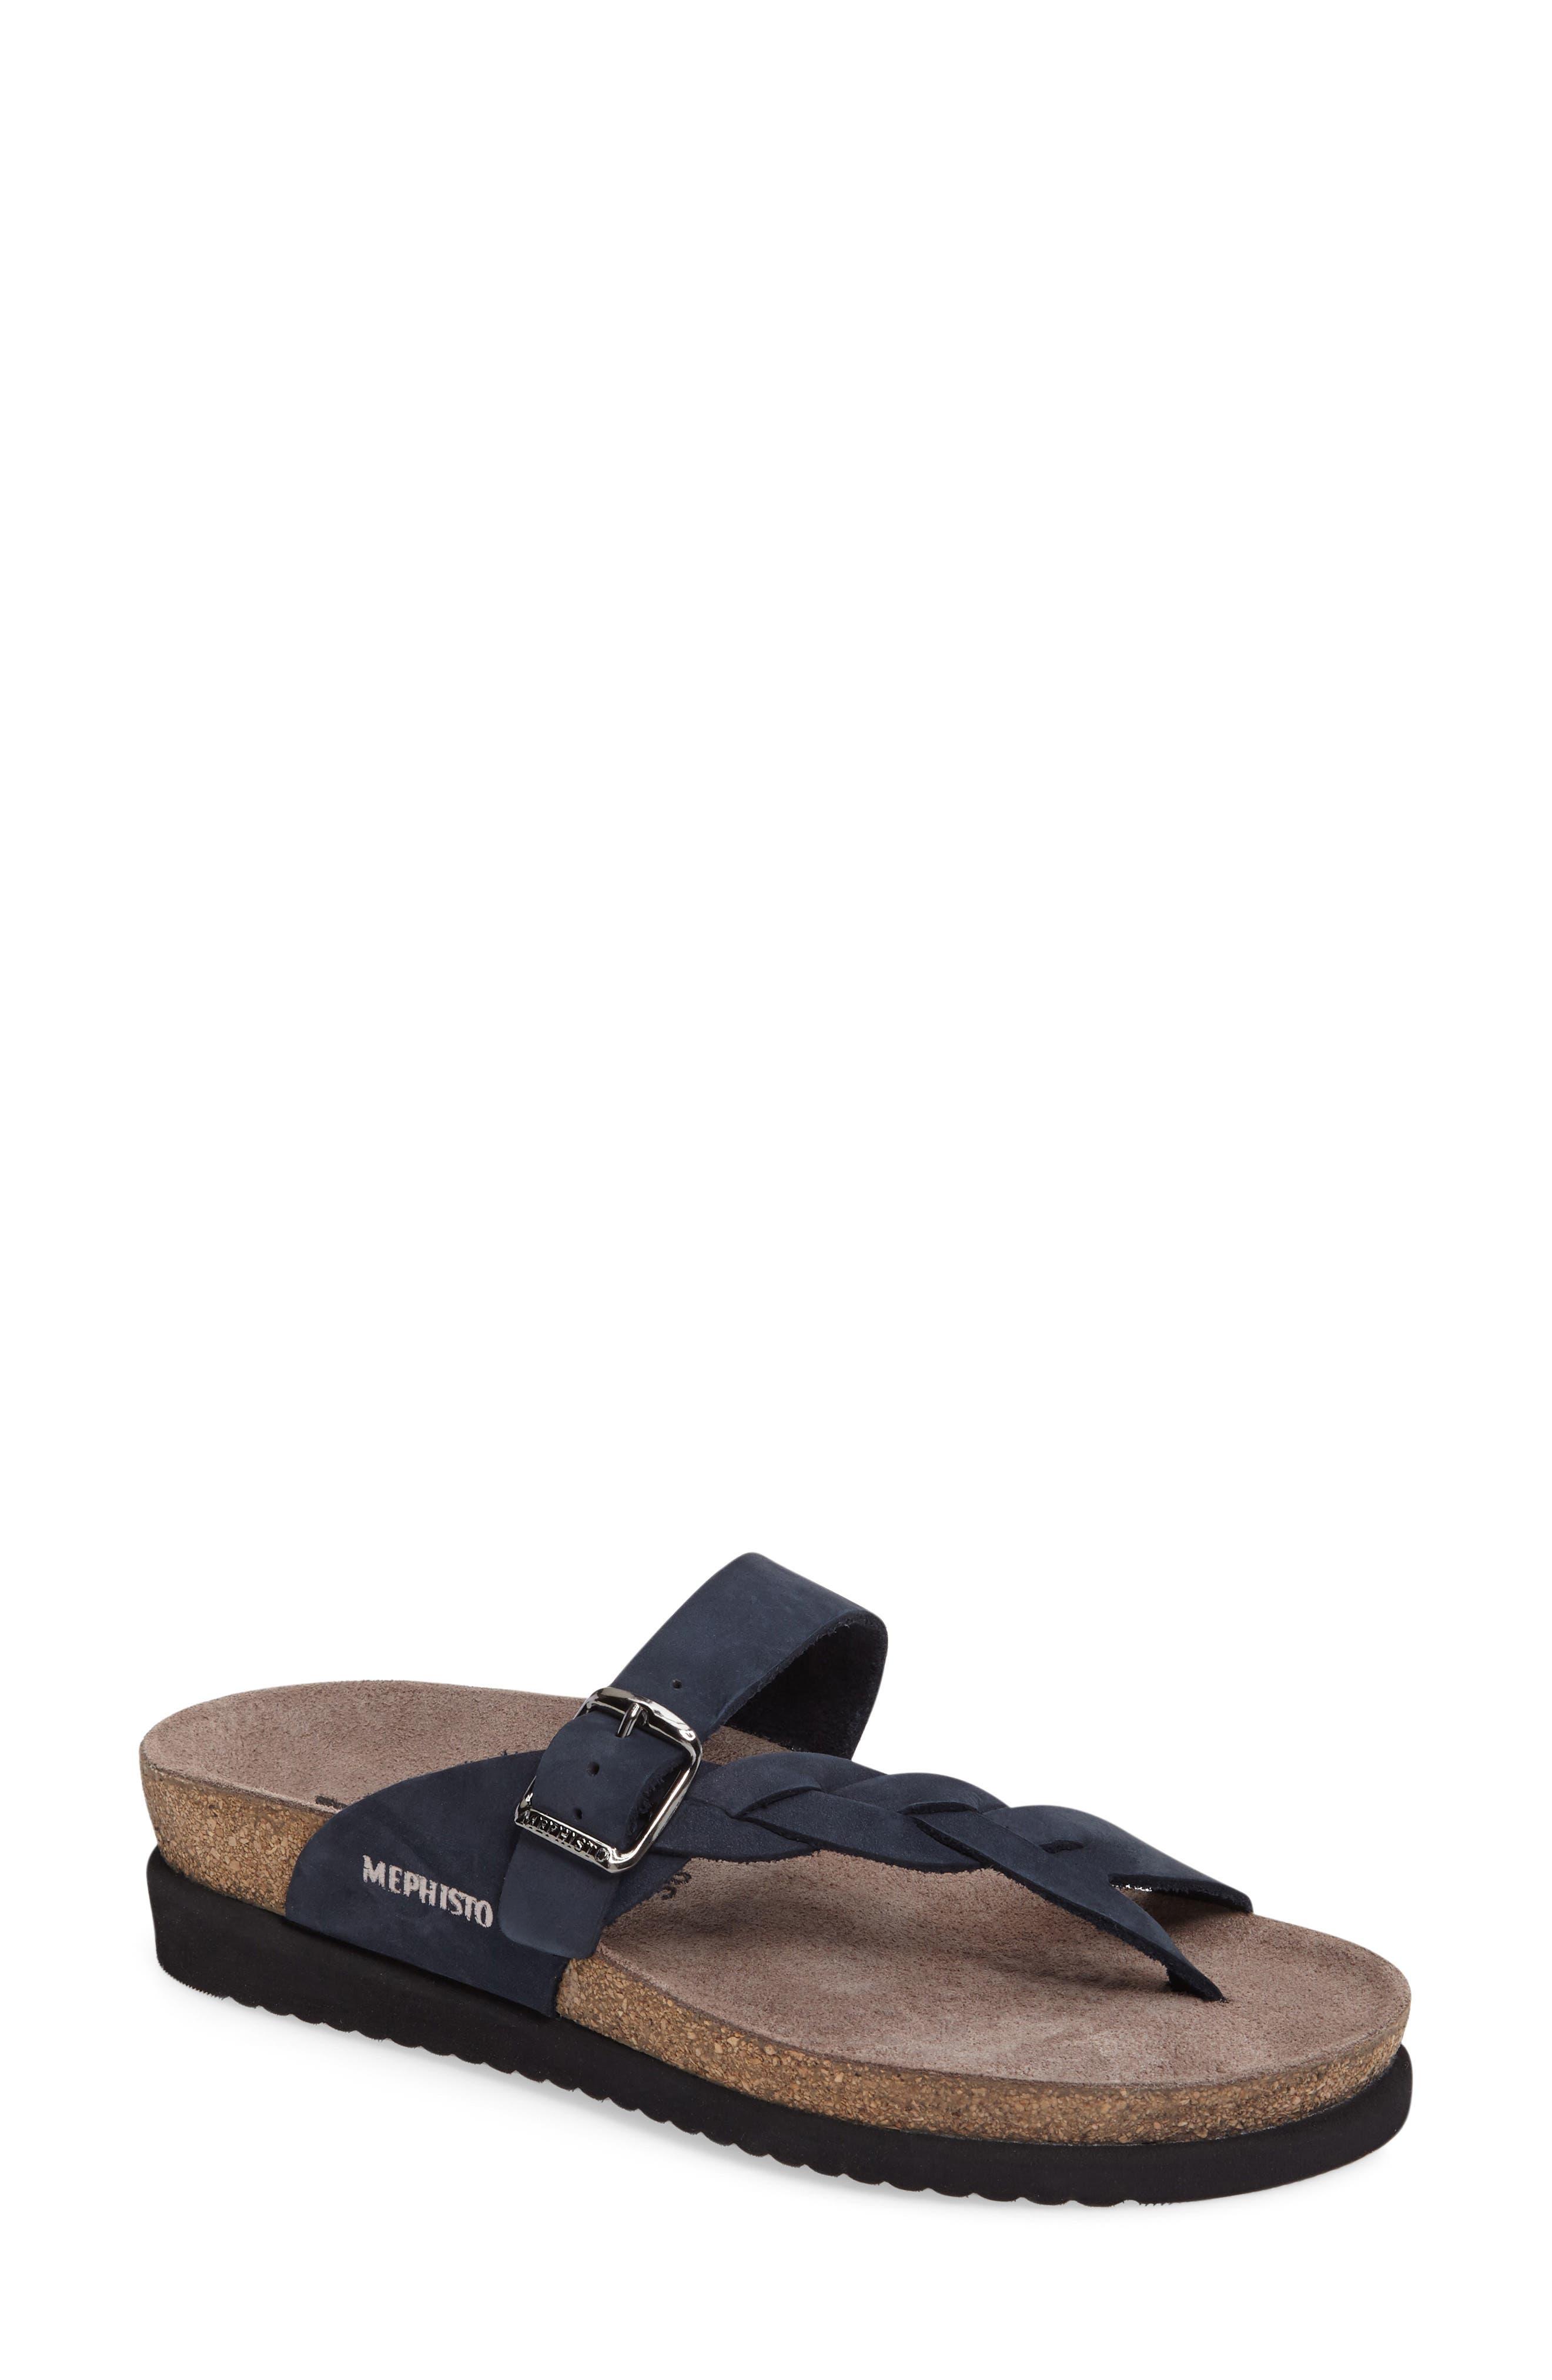 Mephisto 'Helen Twist' Nubuck Leather Sandal (Women)